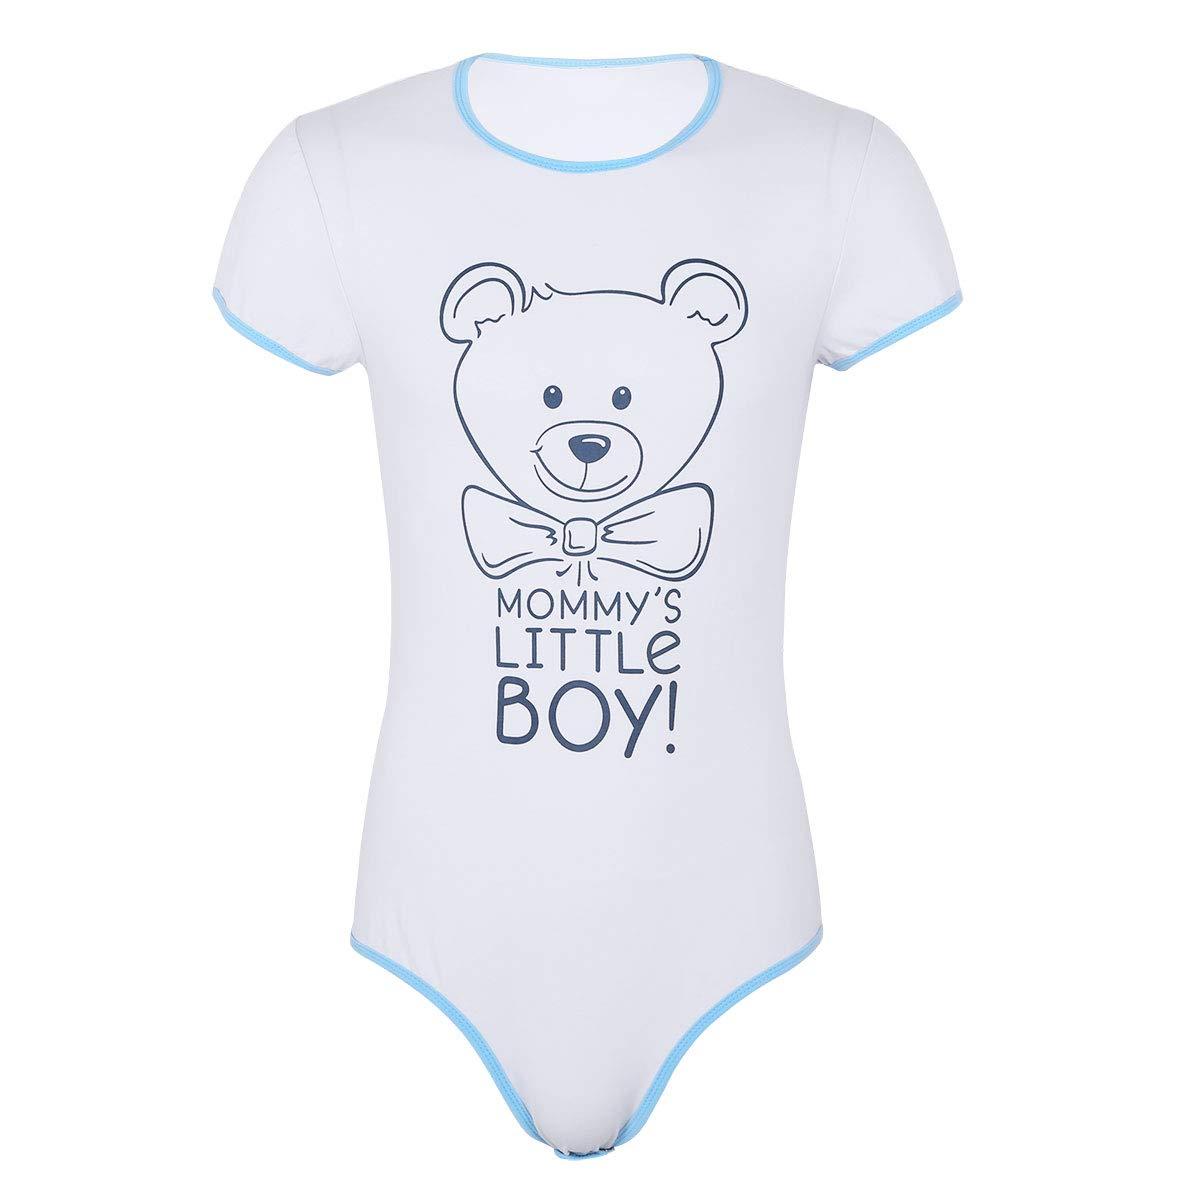 Snap Crotch Romper Onesie Pajamas-Mommys Little Boy ABDL iiniim Adult Baby /& Diaper Lover